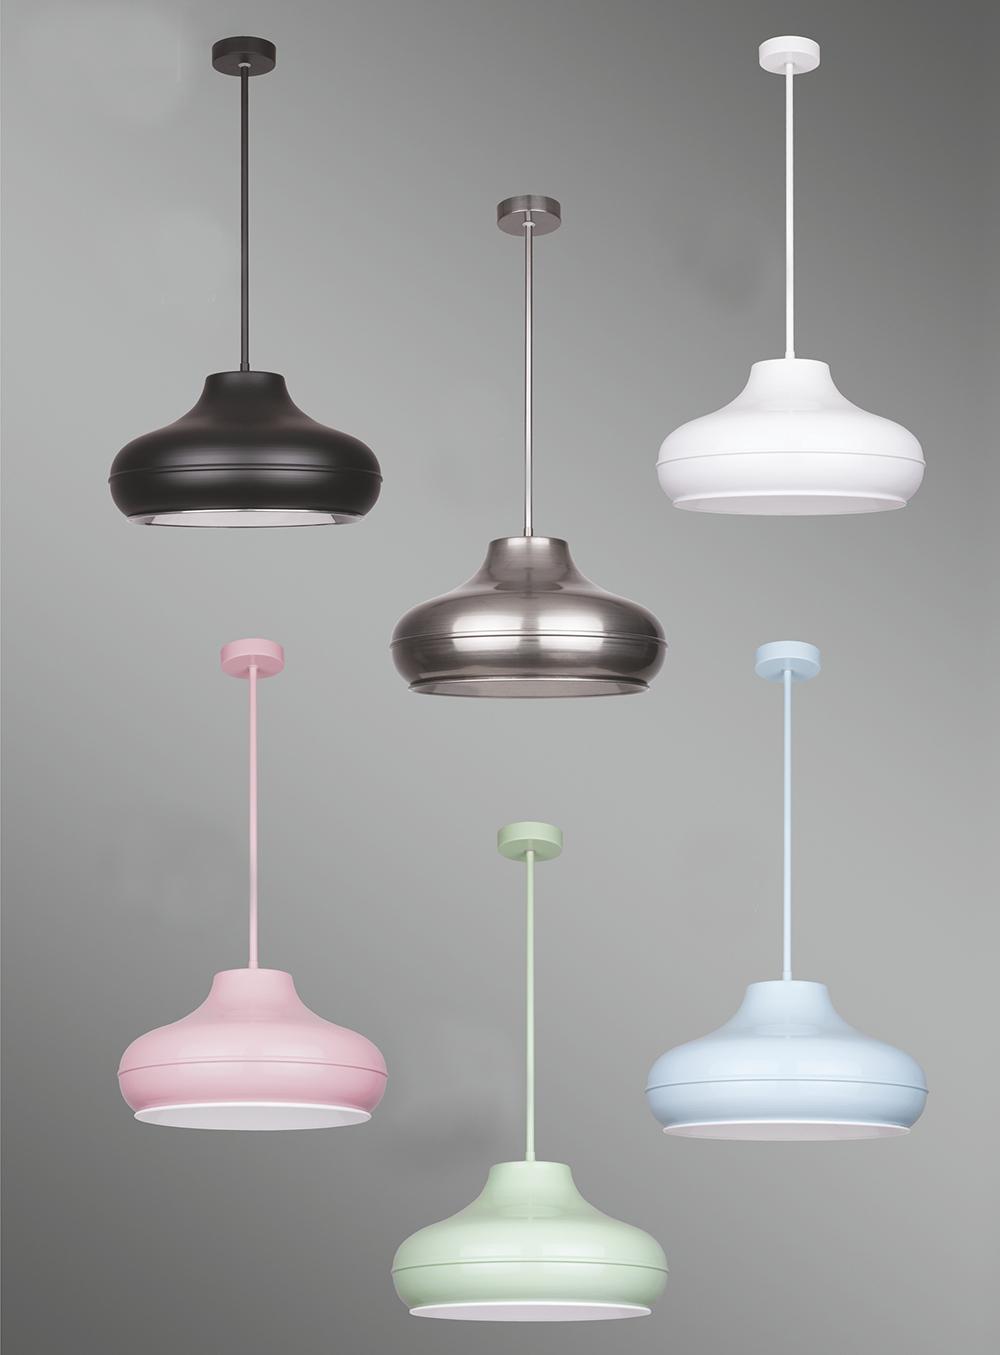 Beti 1 moderne pendellampe hängelampe art deco design lampe chrome